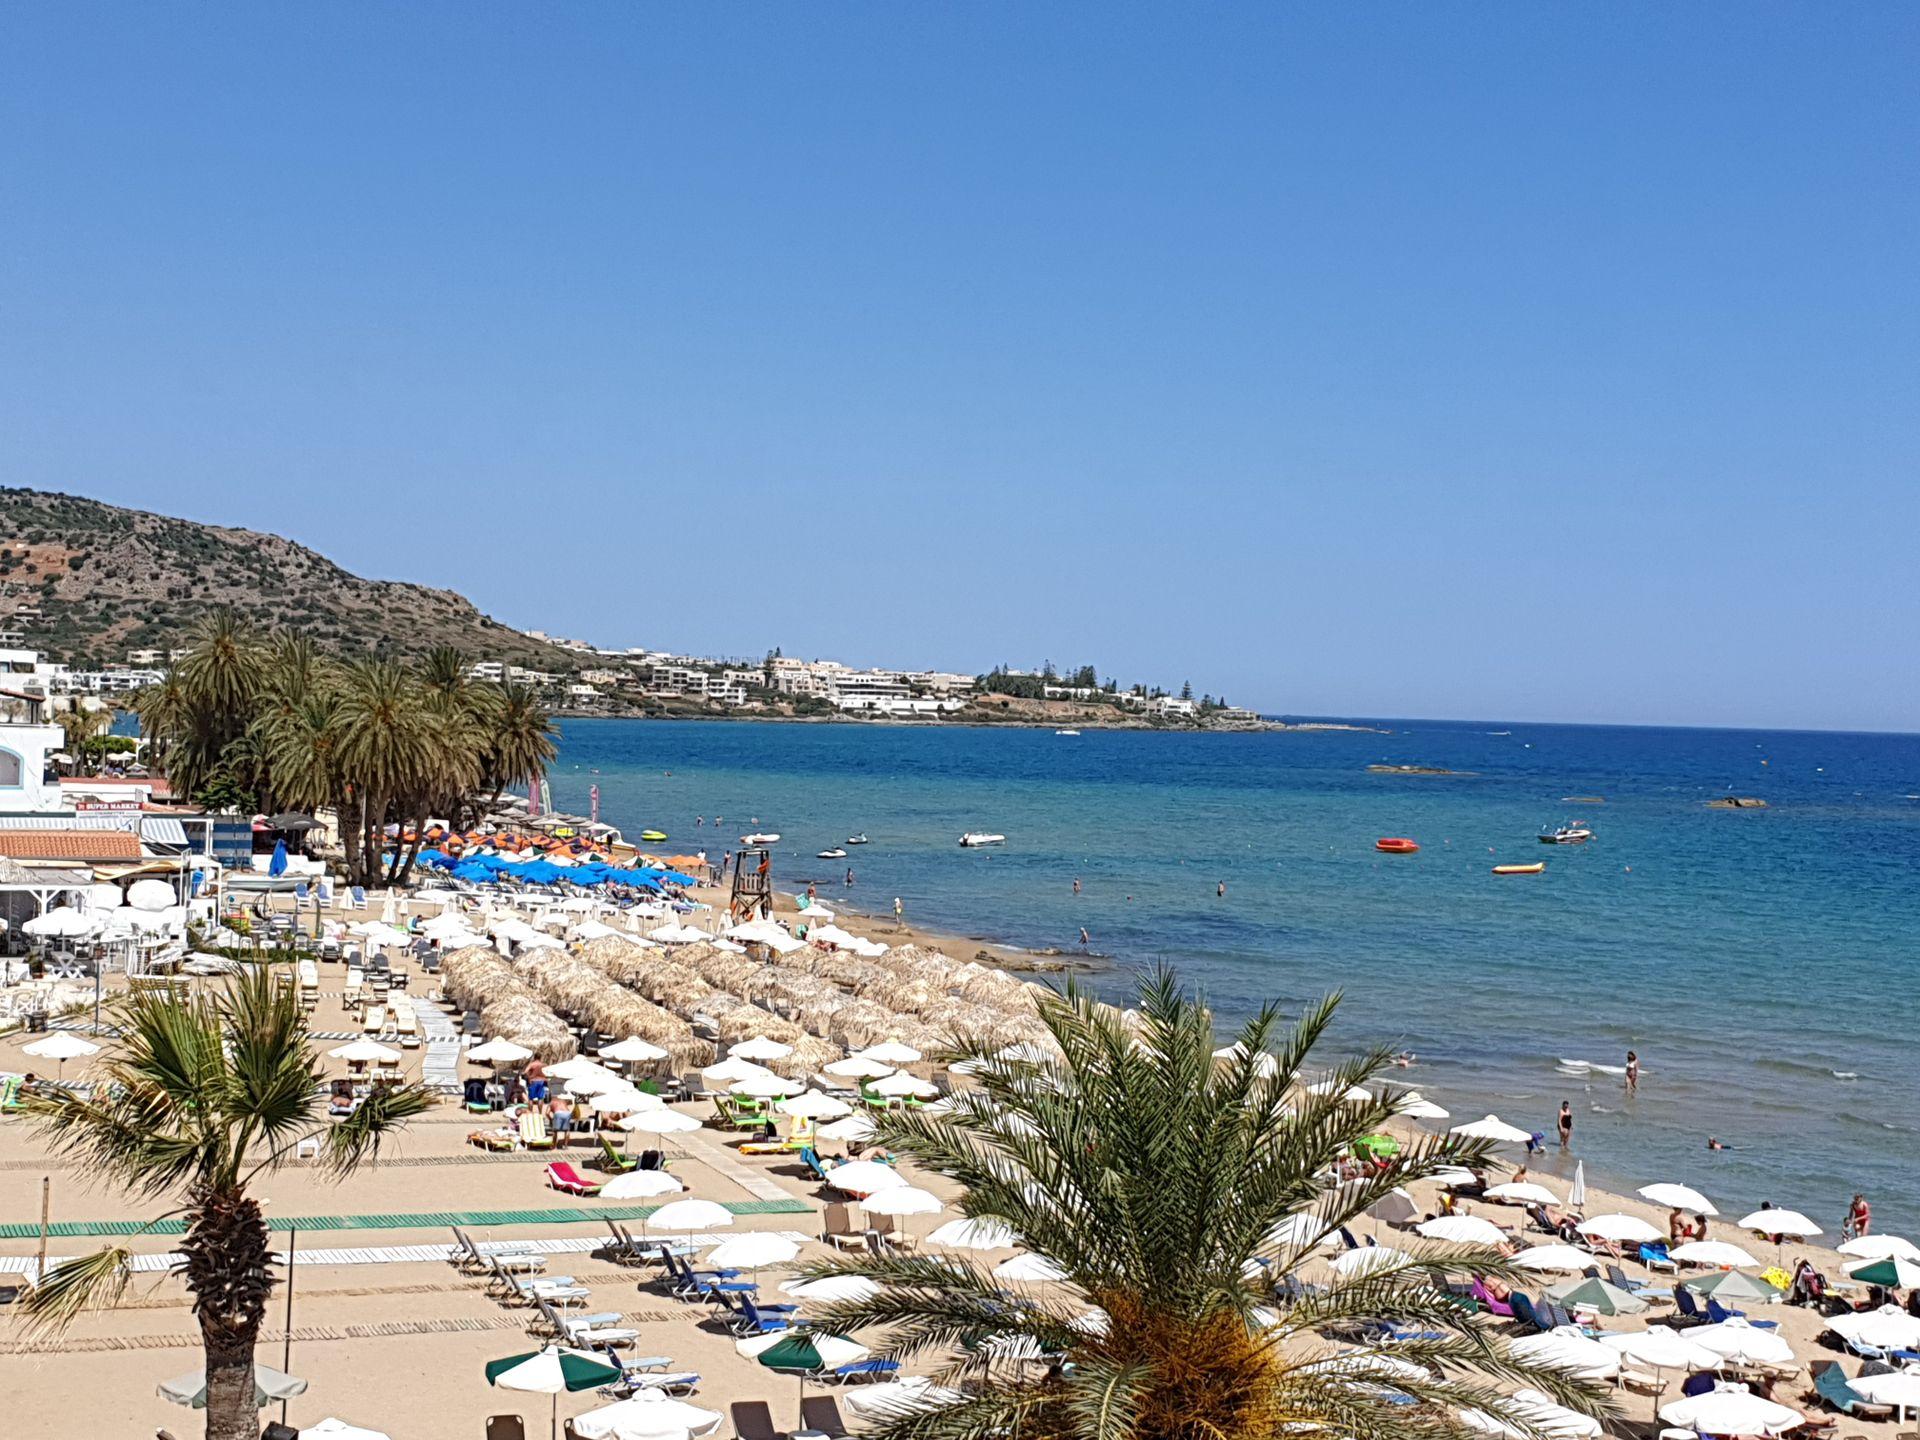 Kreta Karte Stalis.Kreta Stalis 2019 Vakantio